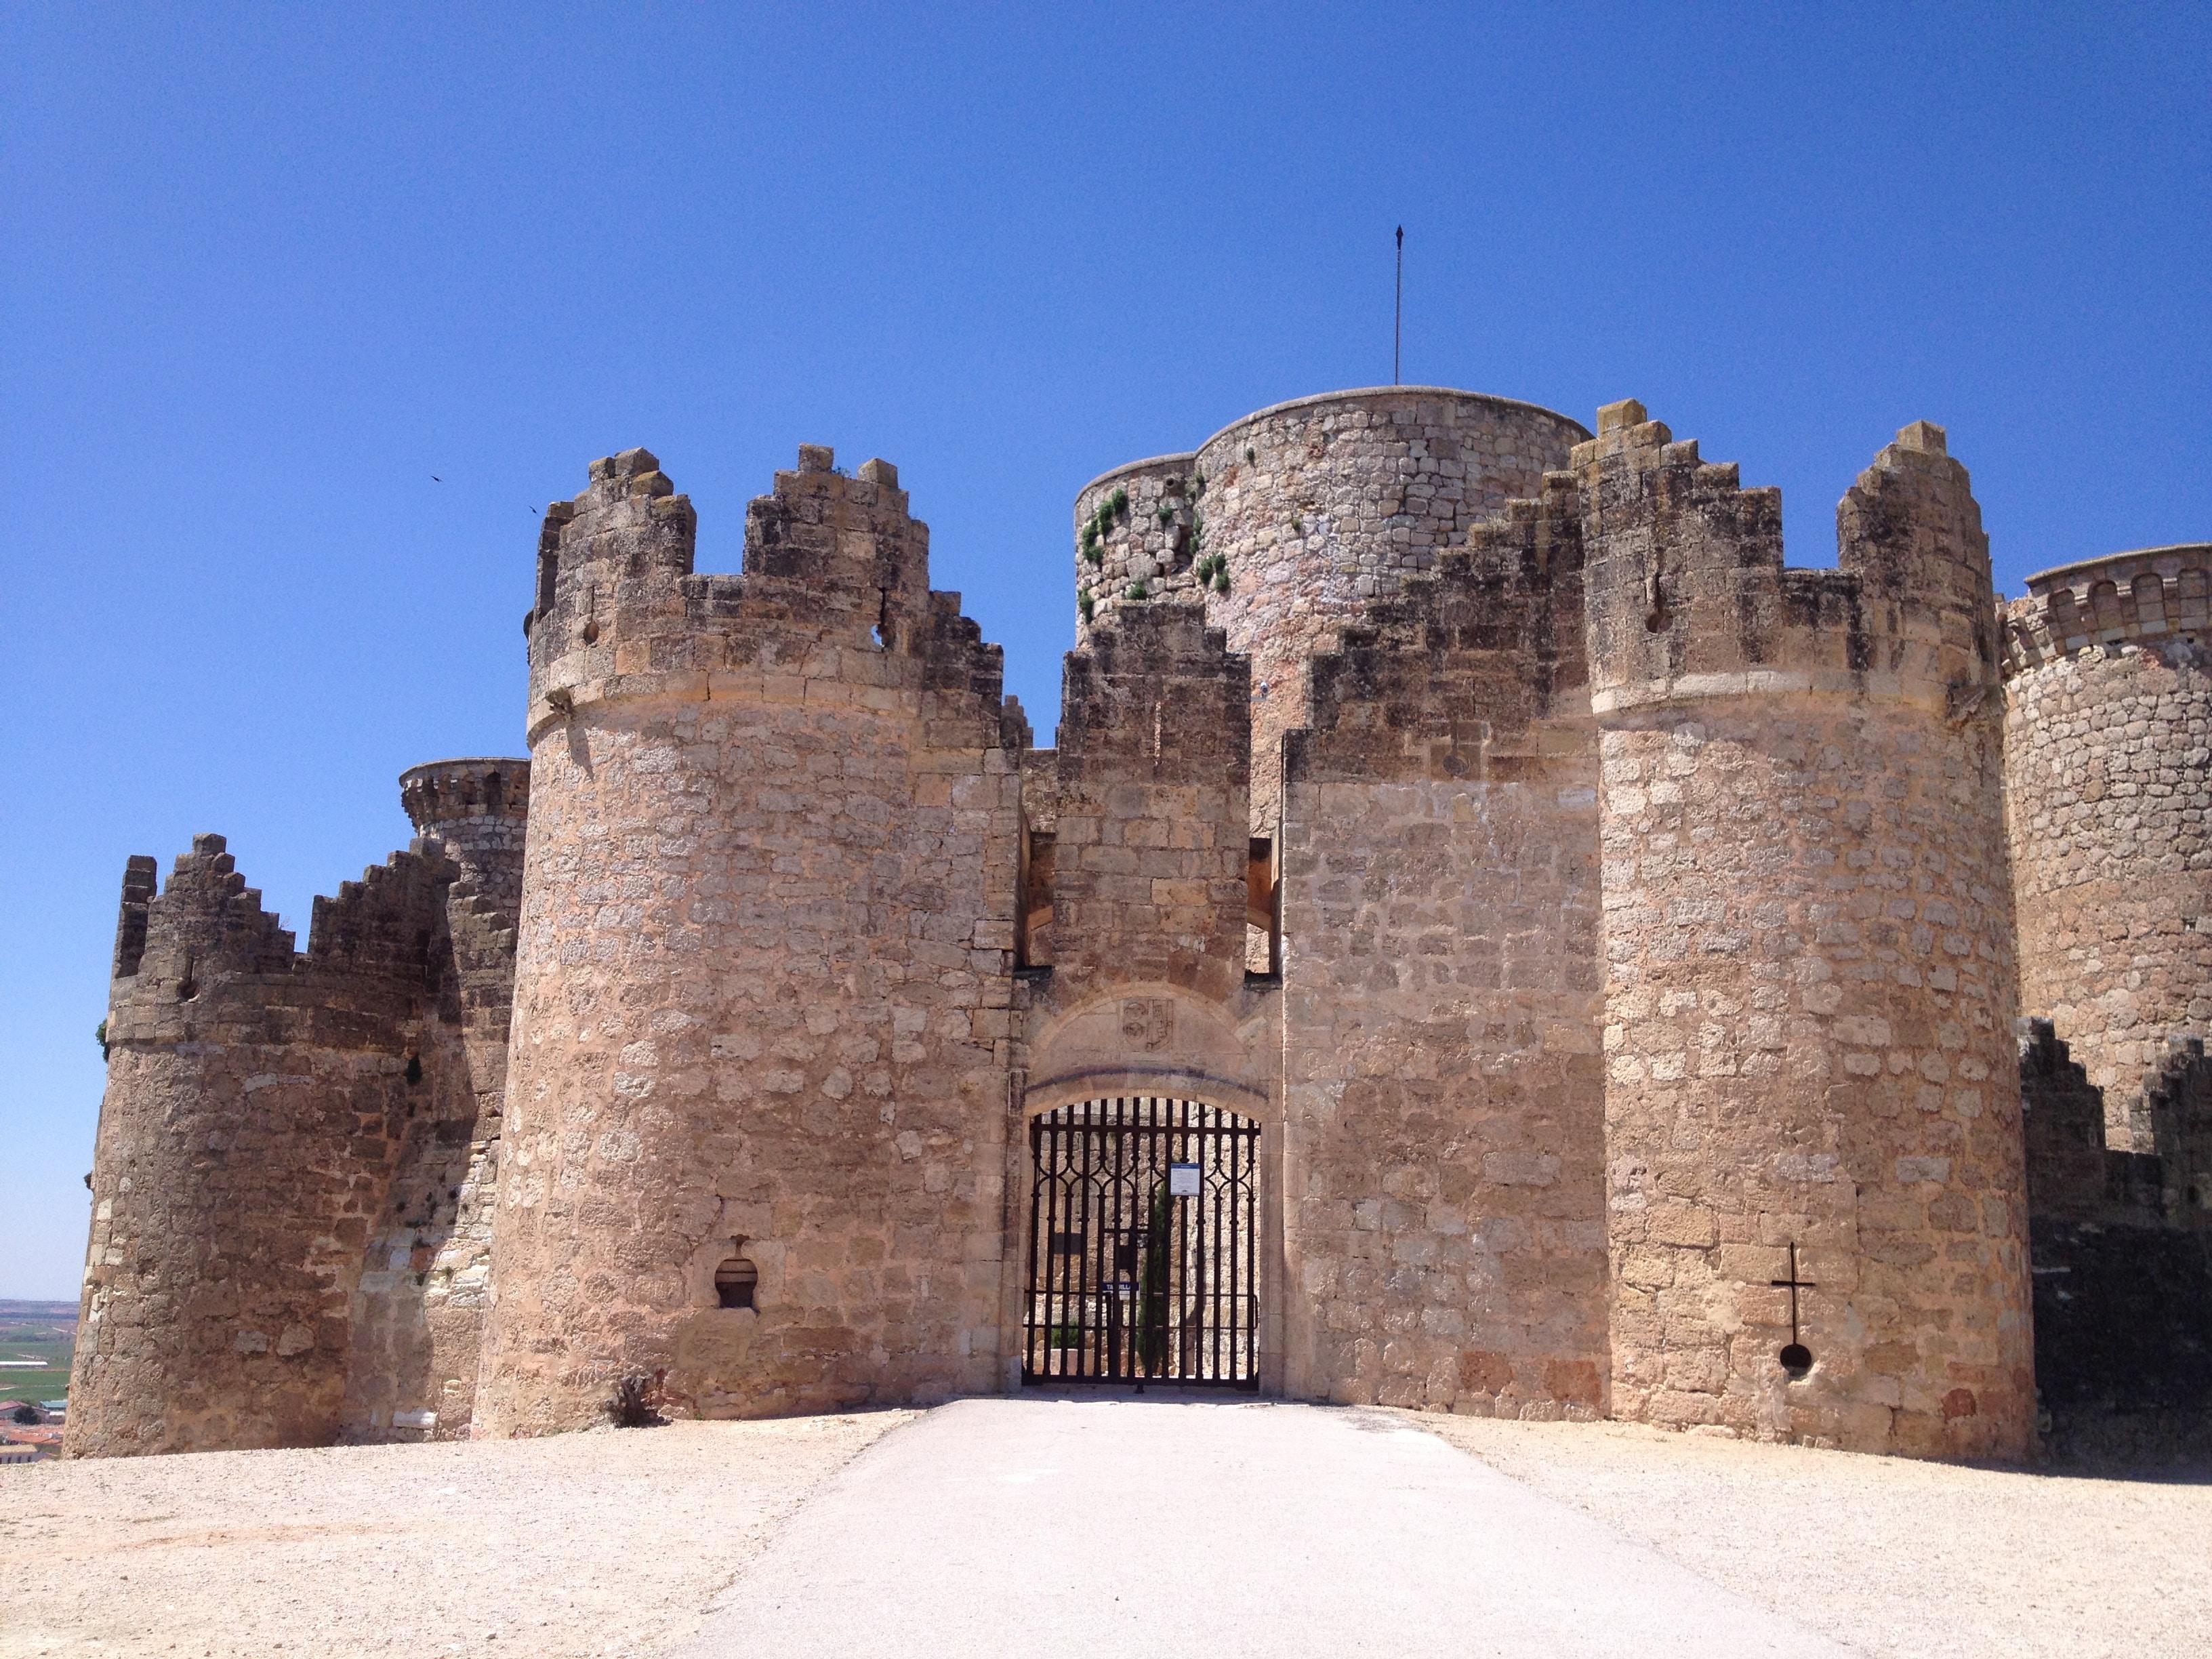 Entrada Castillo Belmonte